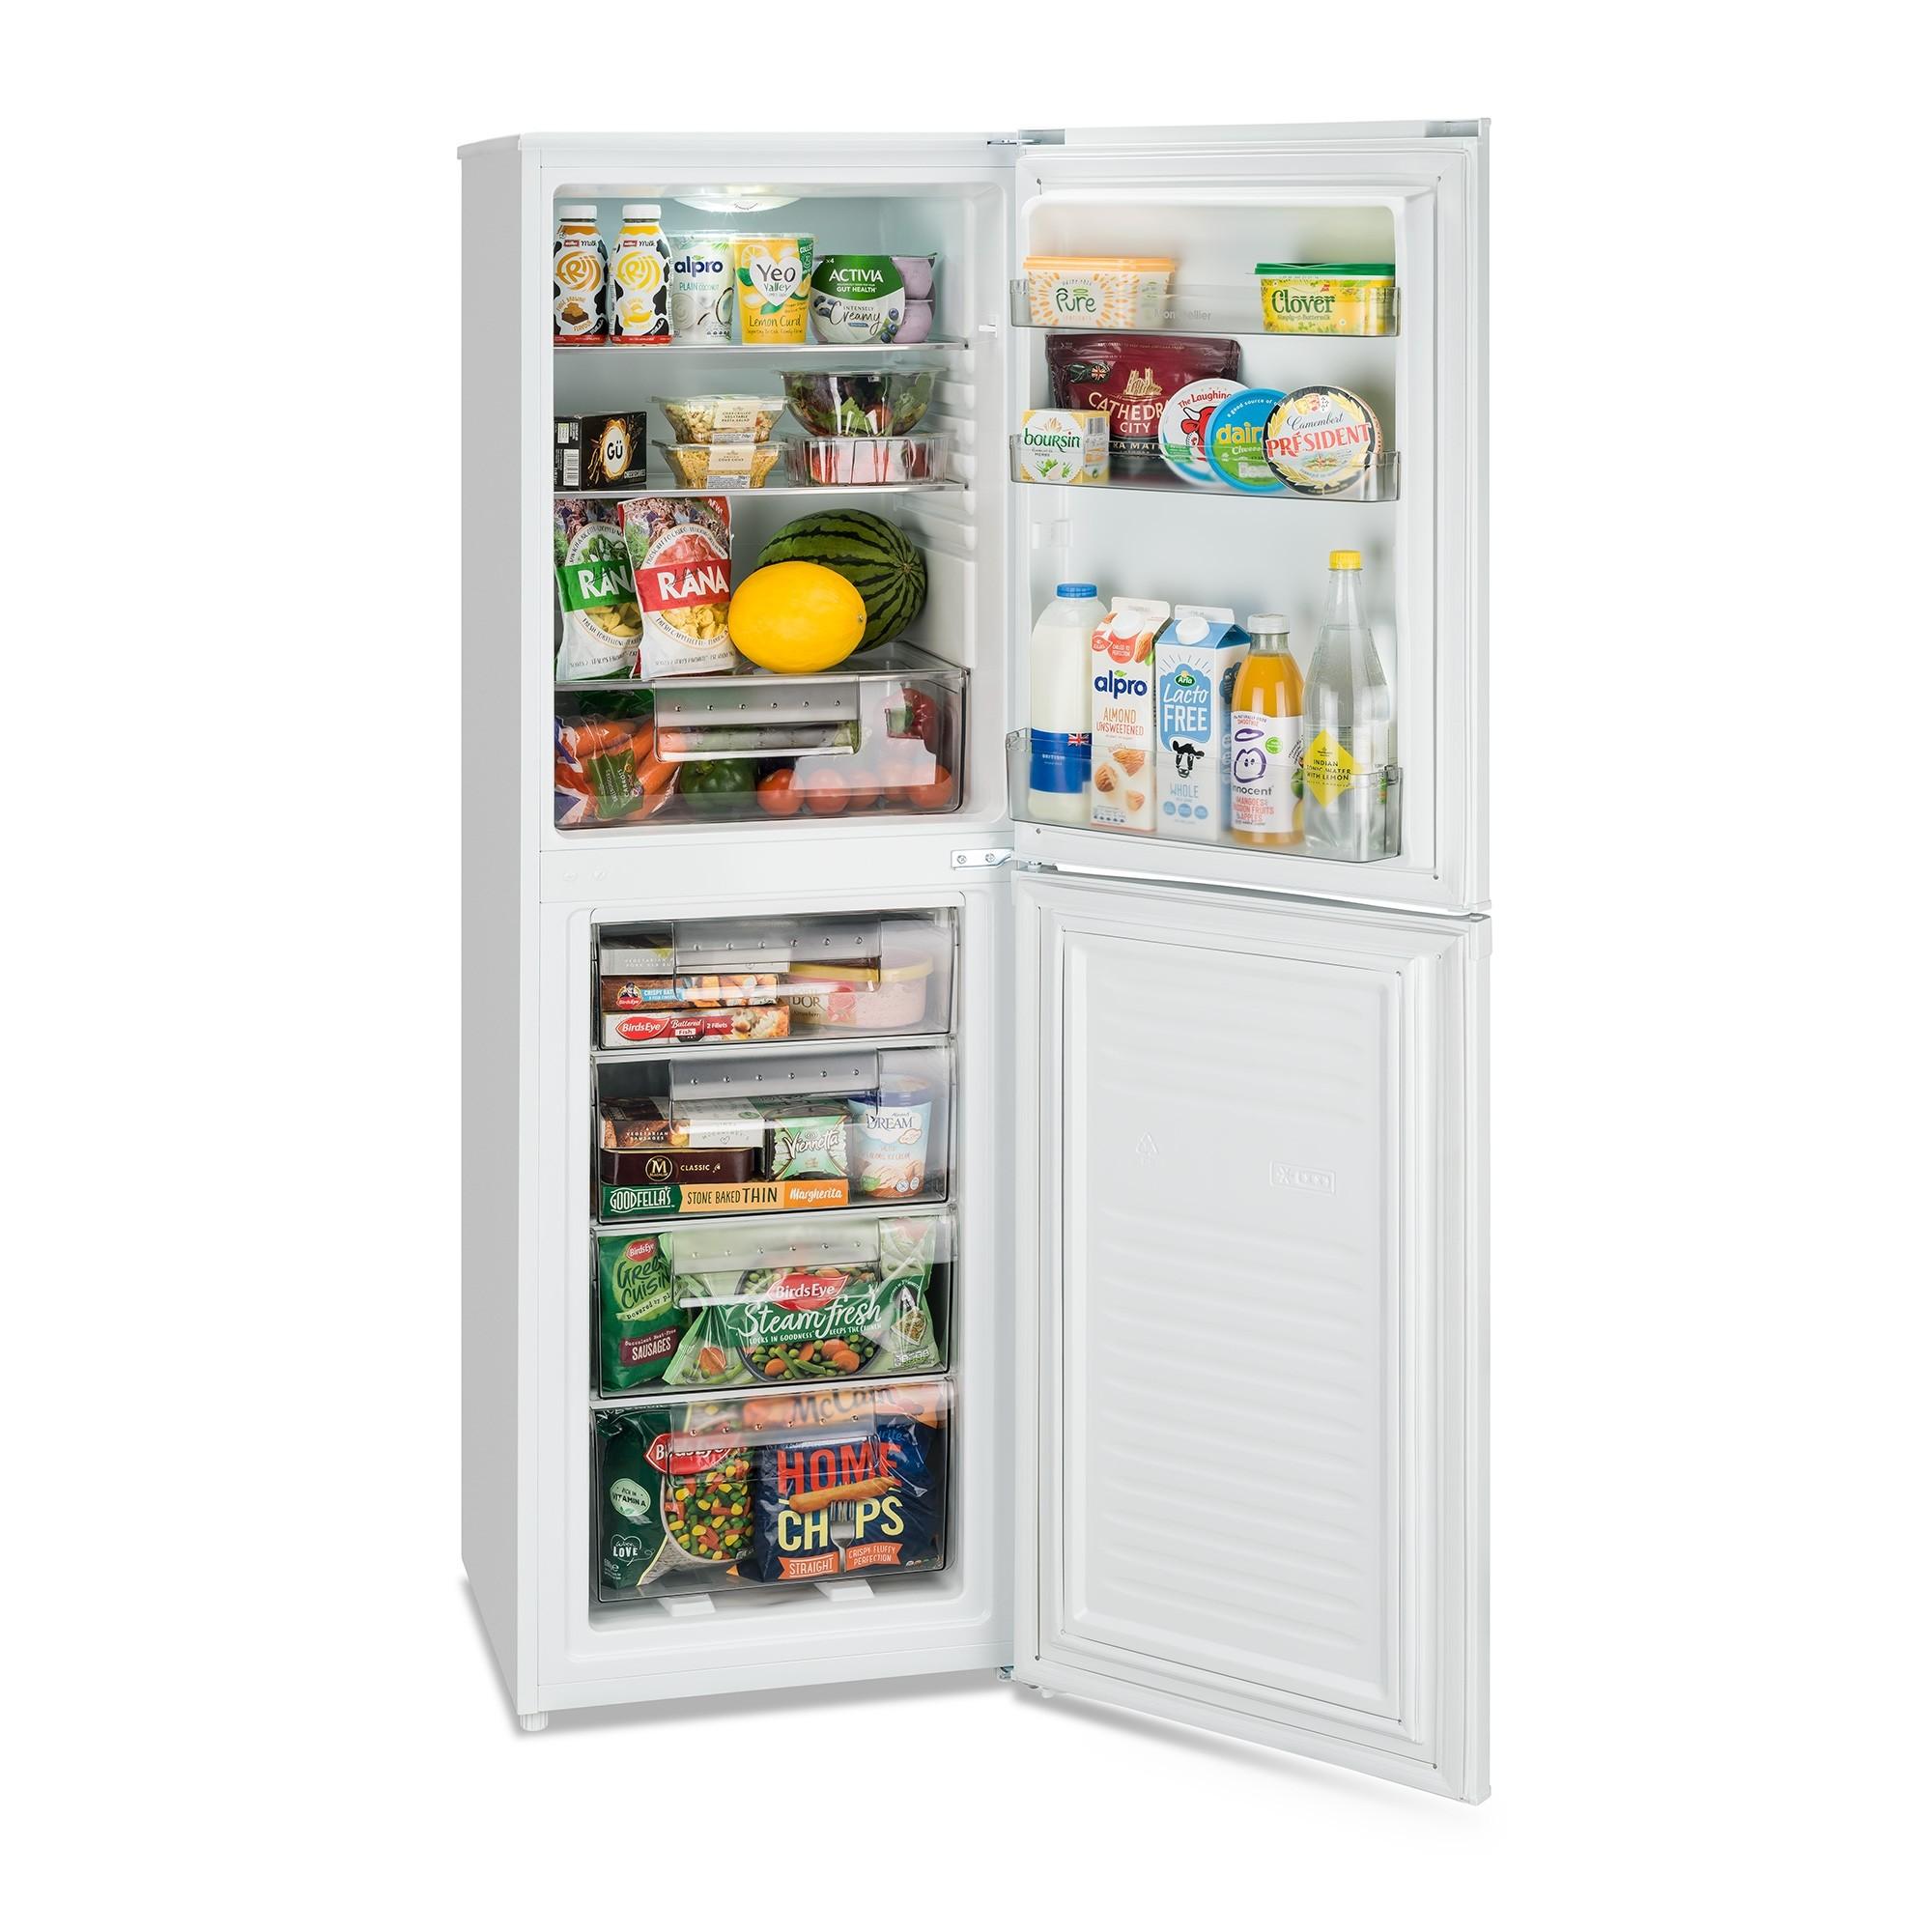 Montpellier MS175W Fridge Freezer